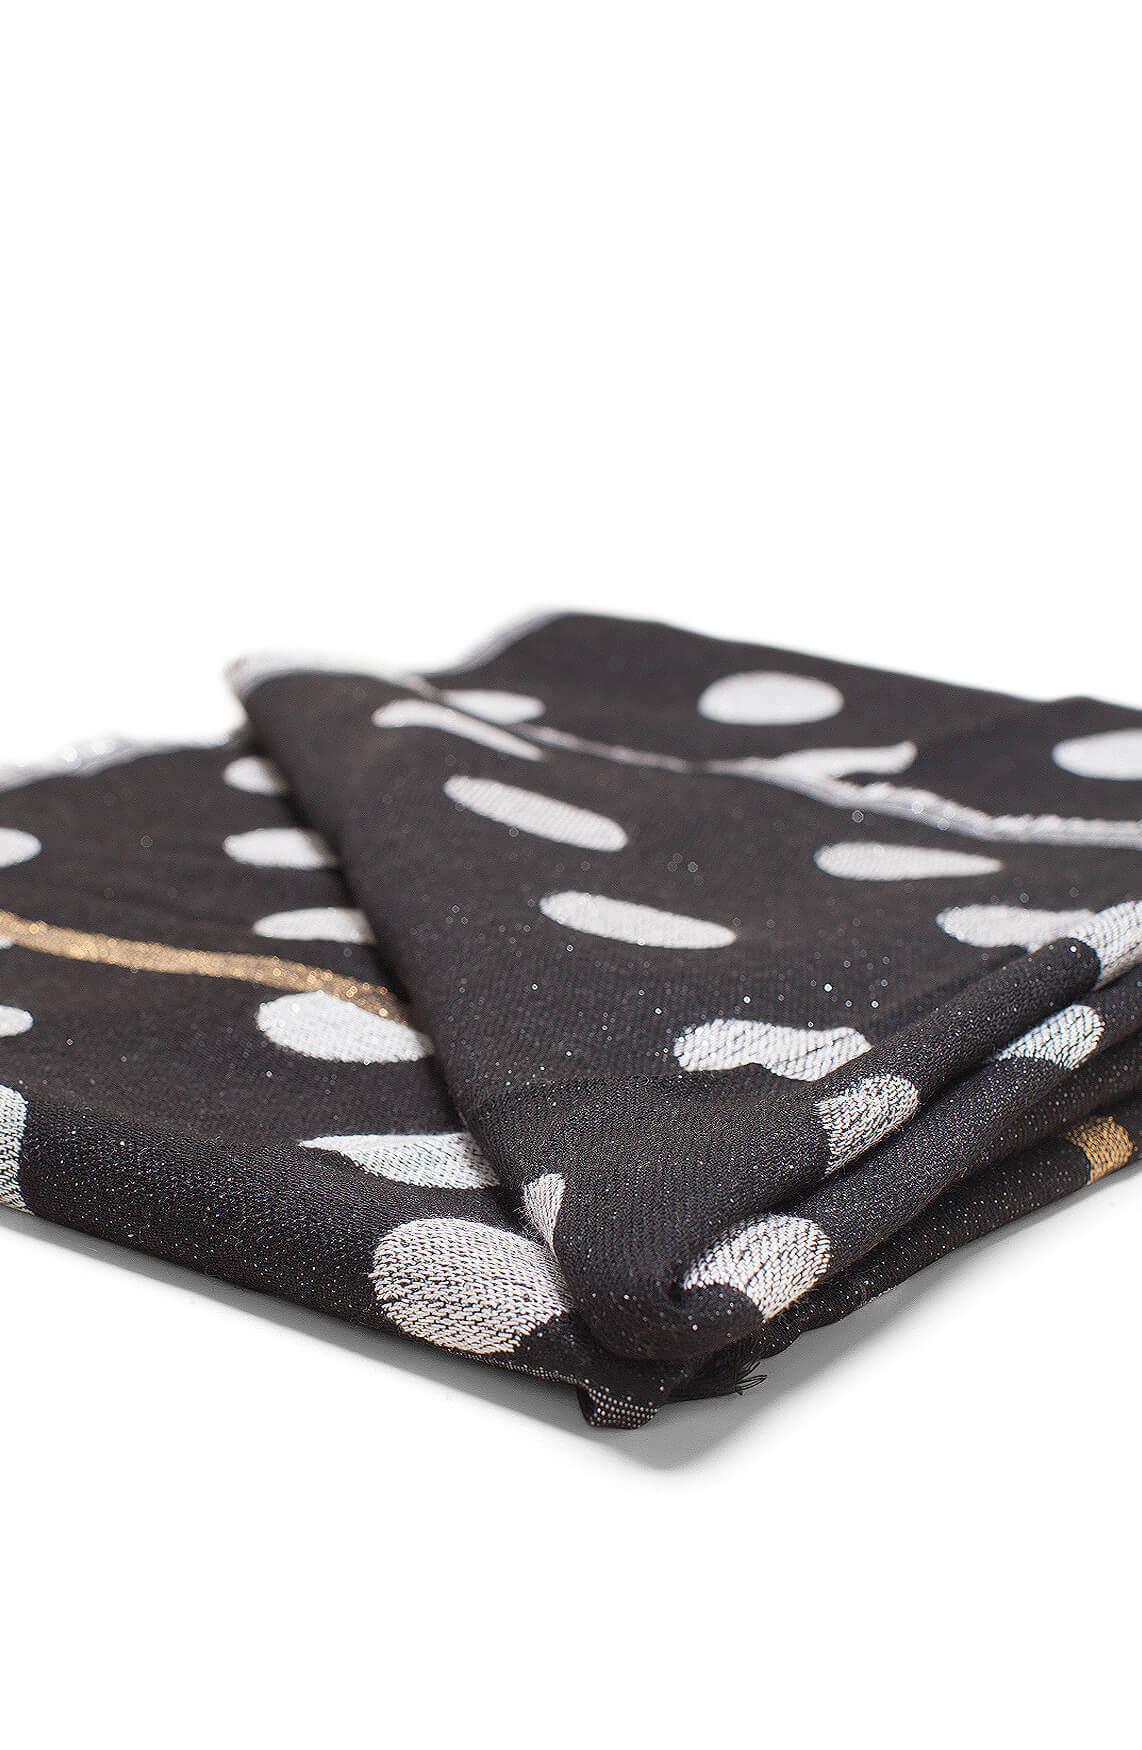 Moment by Moment Dames Ekin shawl met stippen zwart